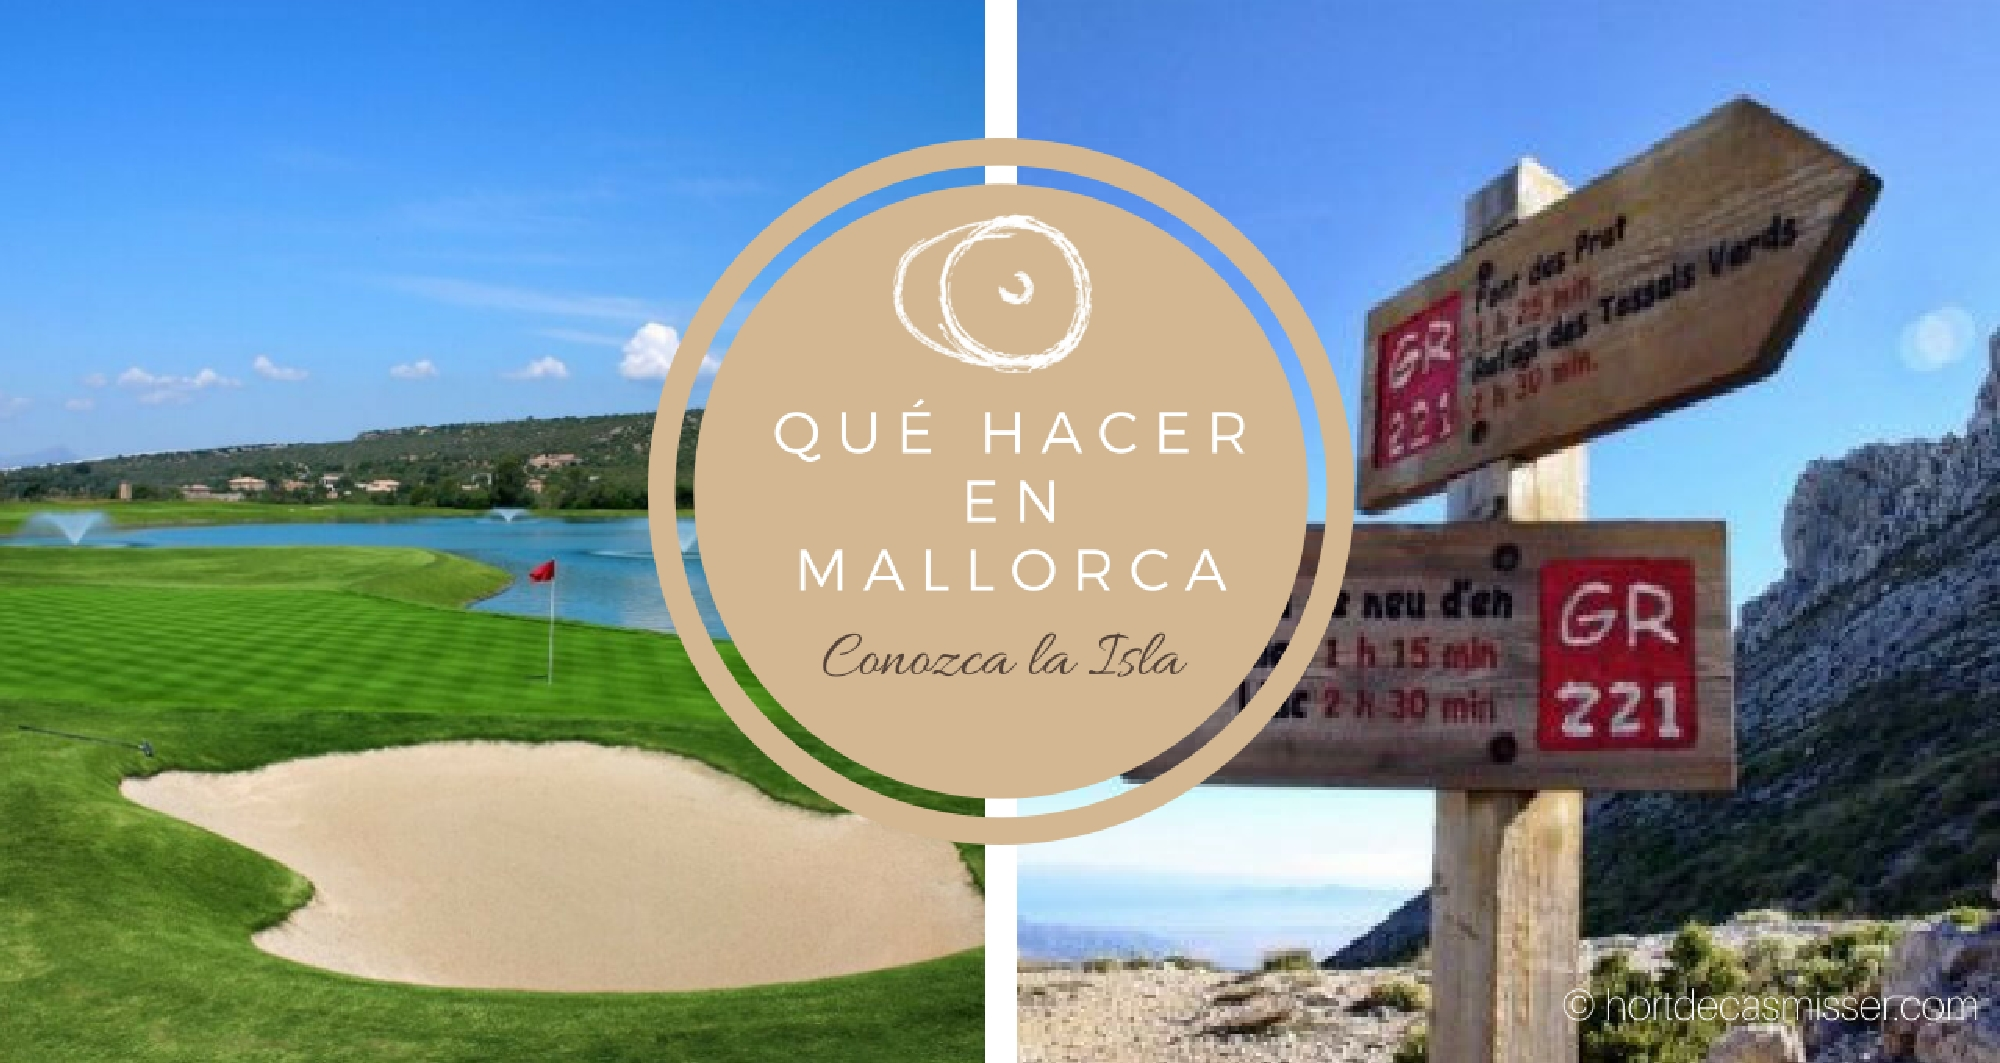 Que Hacer En Mallorca Hort De Cas Misser Portada